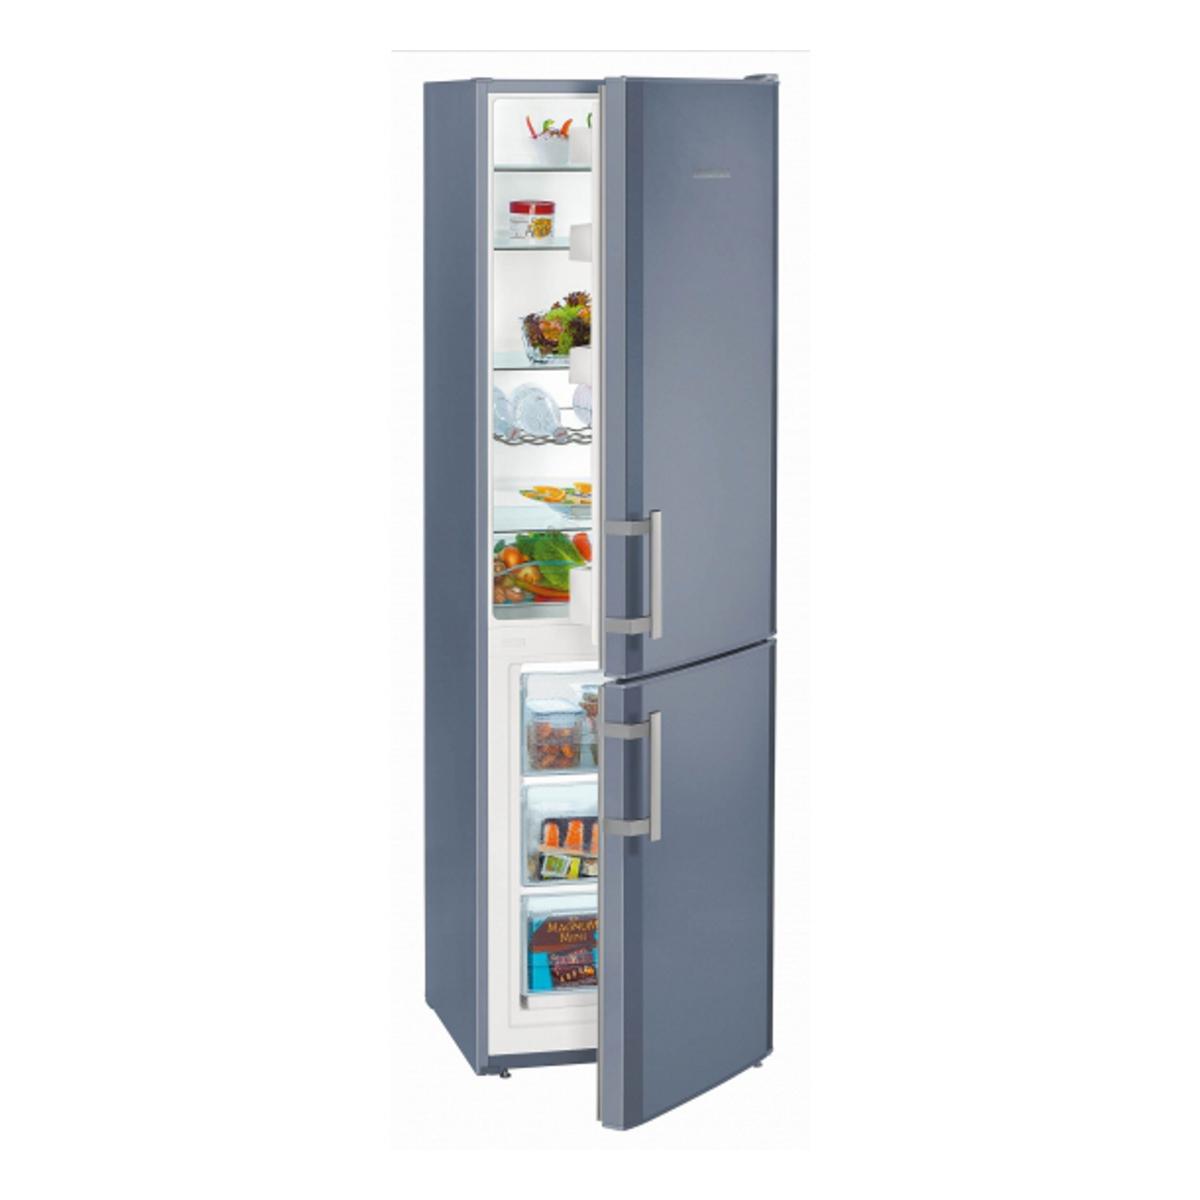 Liebherr Cuwb3311 Fridge Freezer 55cm A Energy Rating In